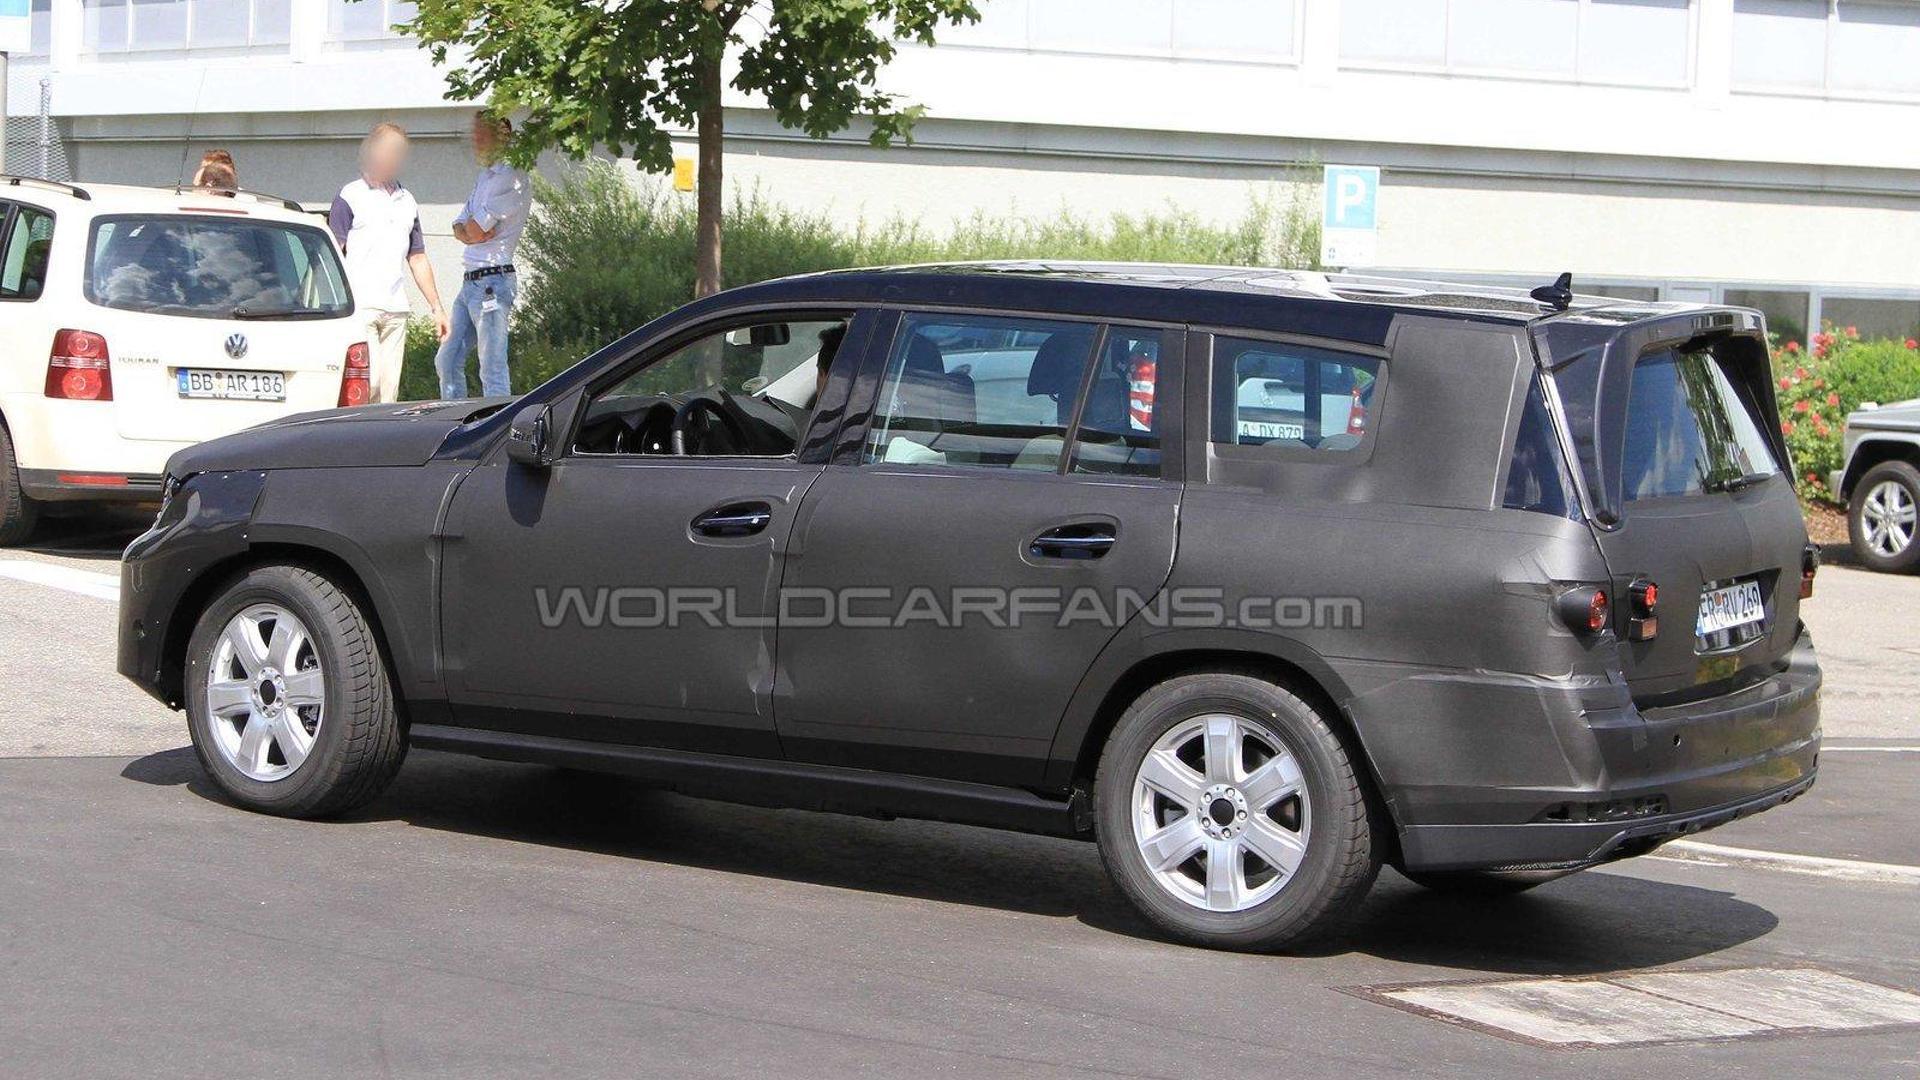 Next-generation 2012 Mercedes GL-Class spied